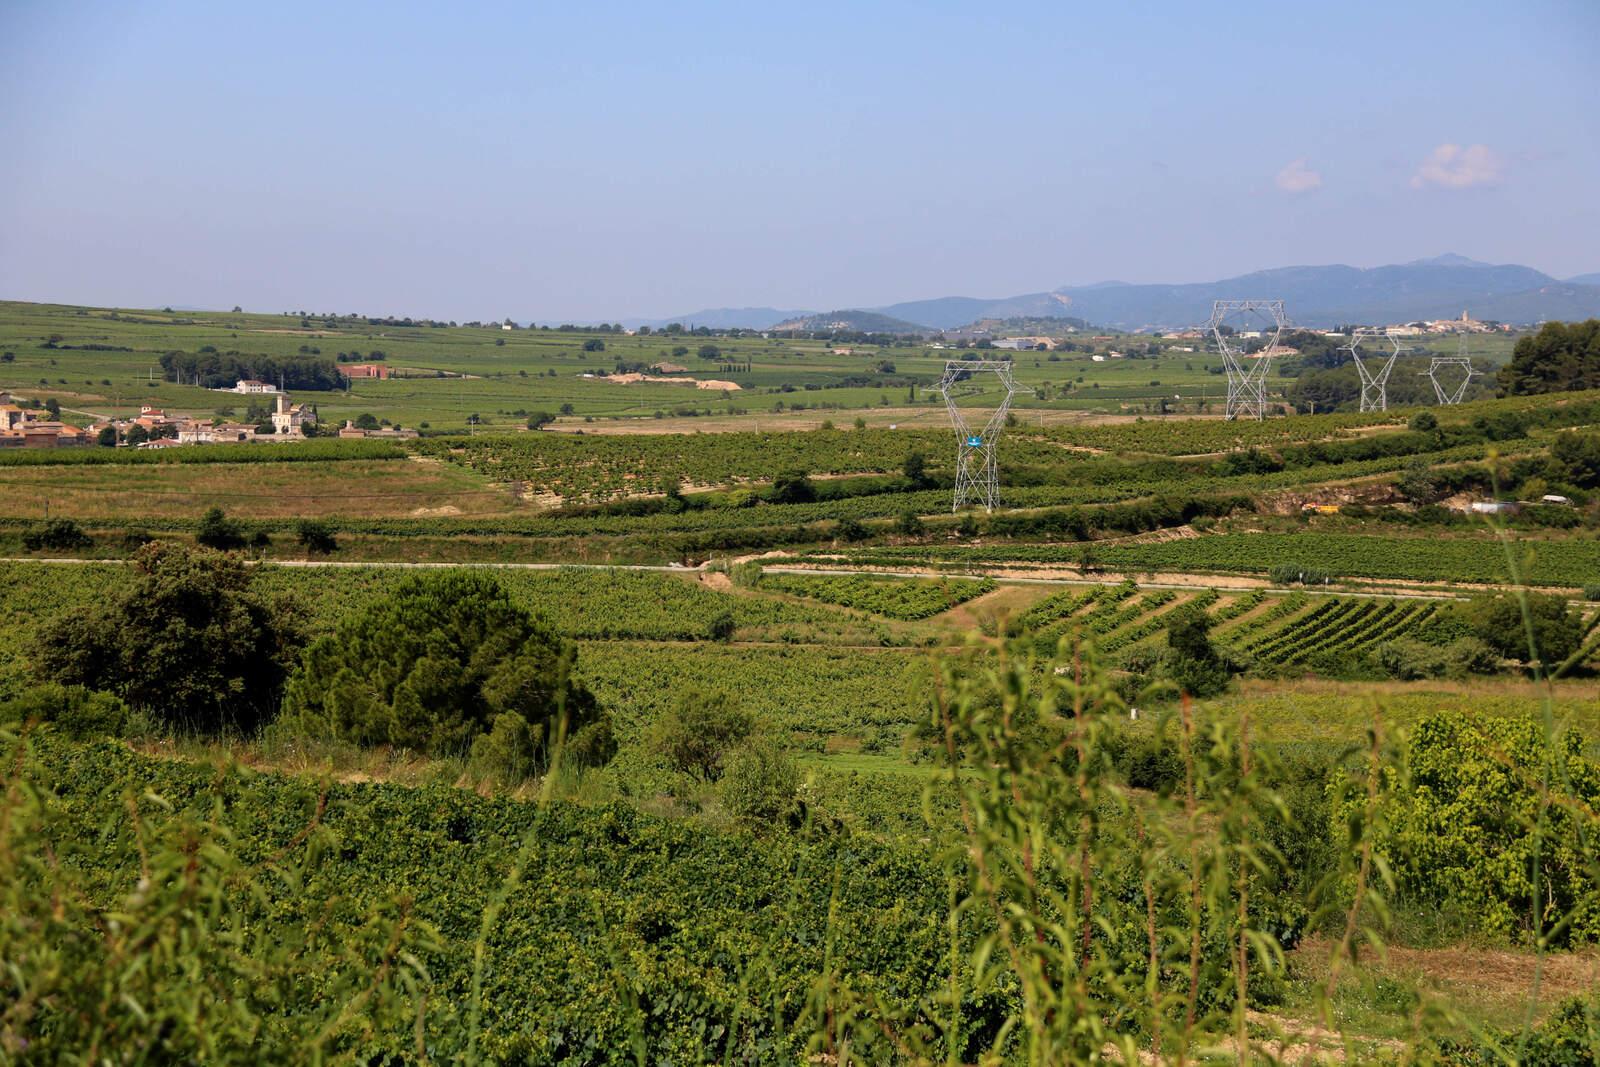 Paisatge de vinyes a l'Alt Penedès